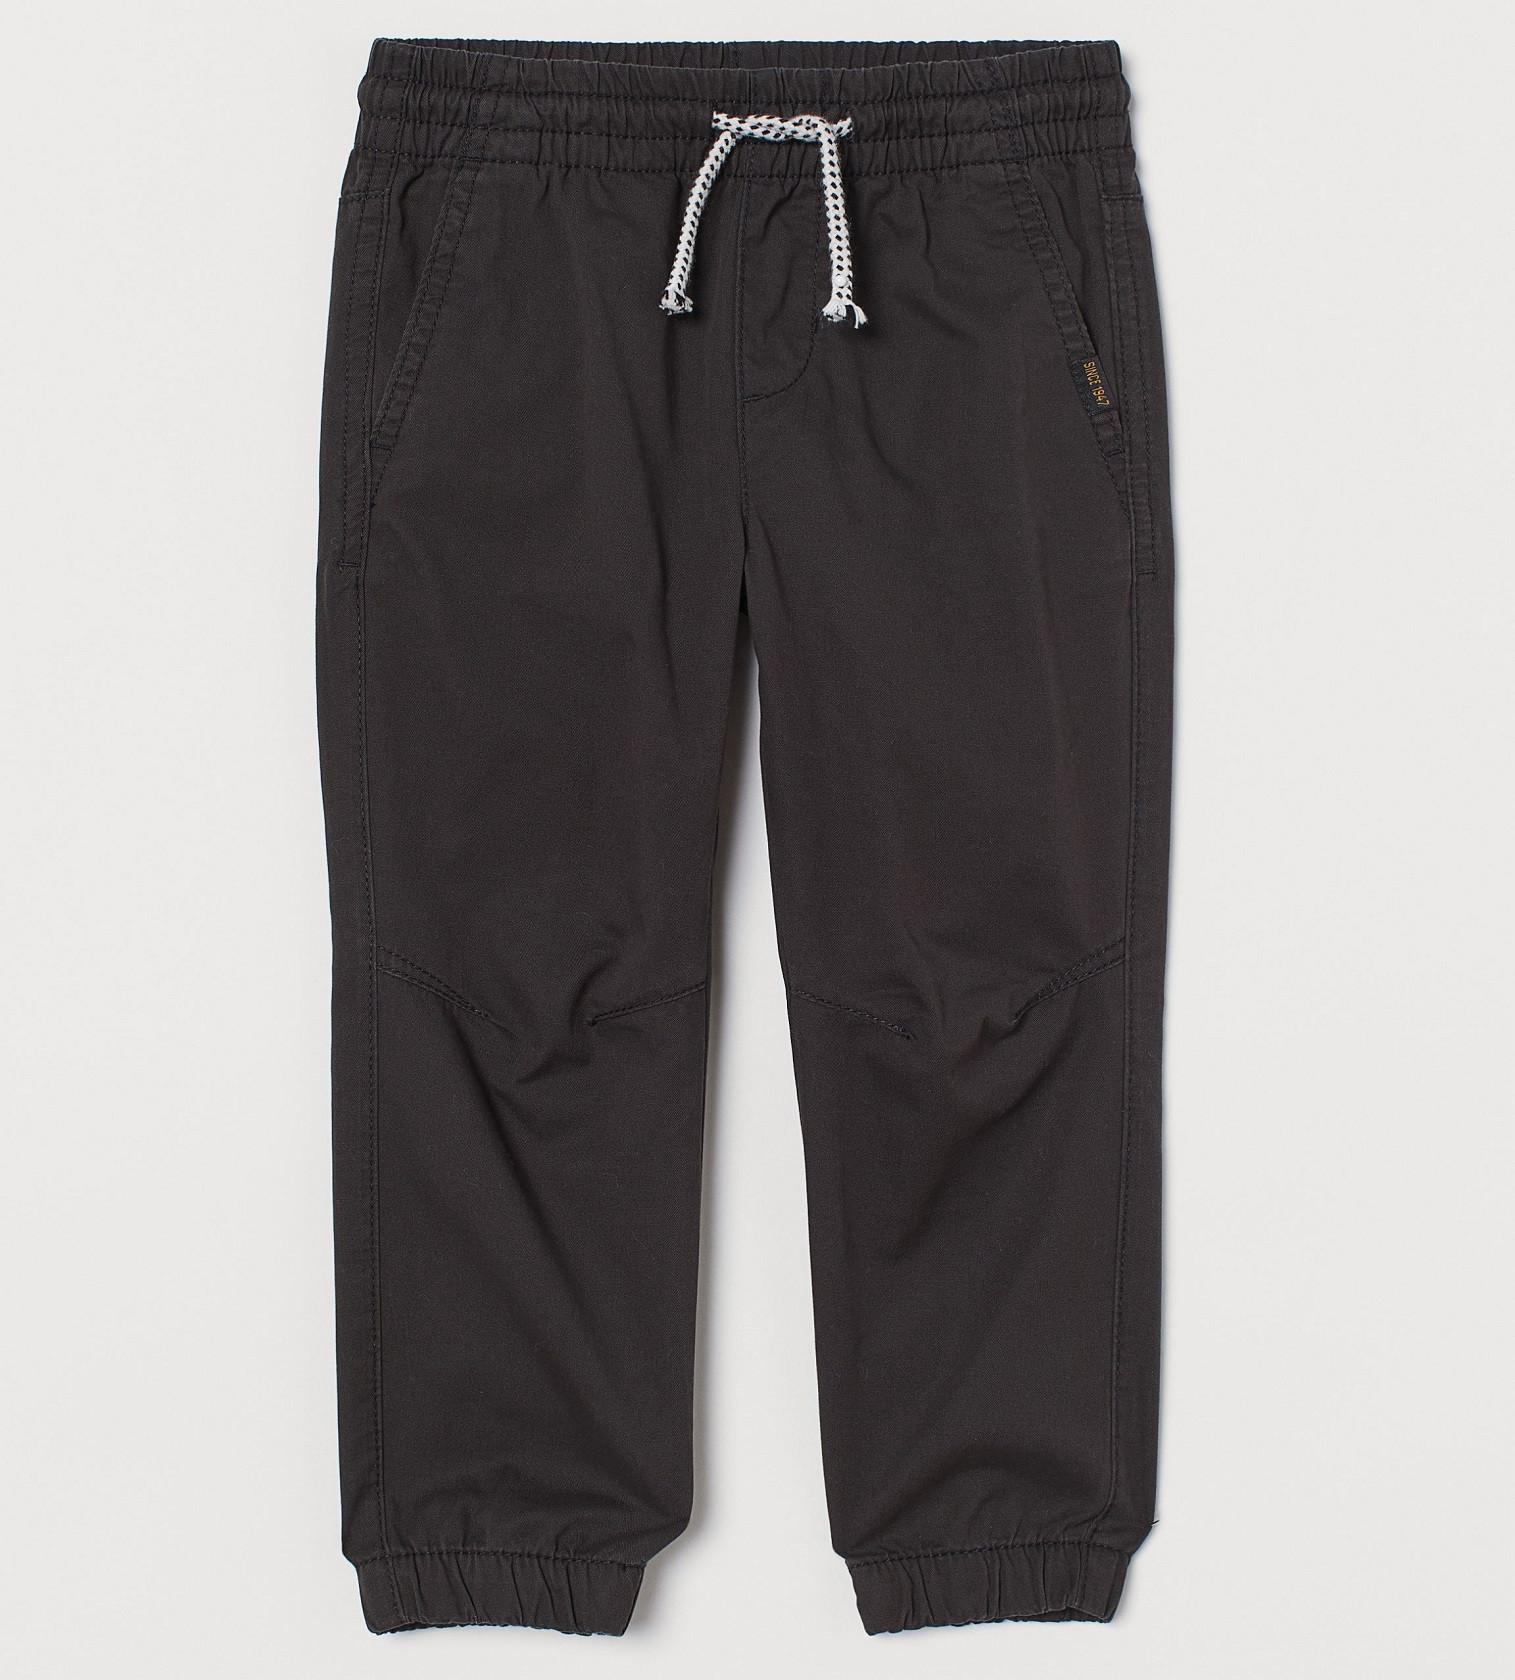 Купити Джоггерси H&M Gray-black - фото 1